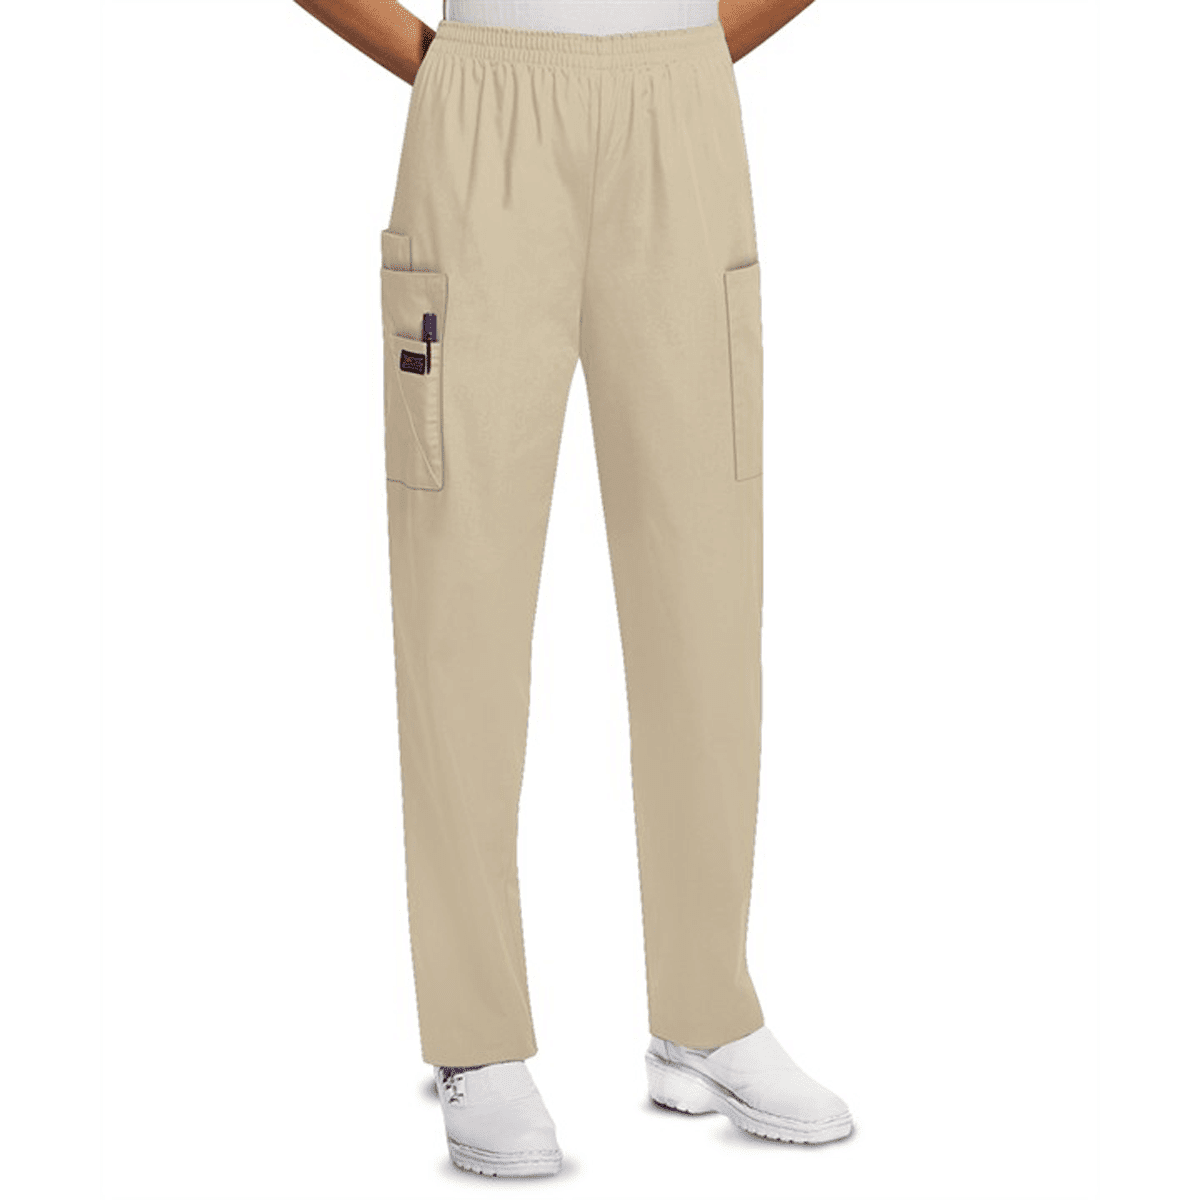 ce695e142c9 Cherokee Scrub Pants   4200 Style   Interweave Healthcare